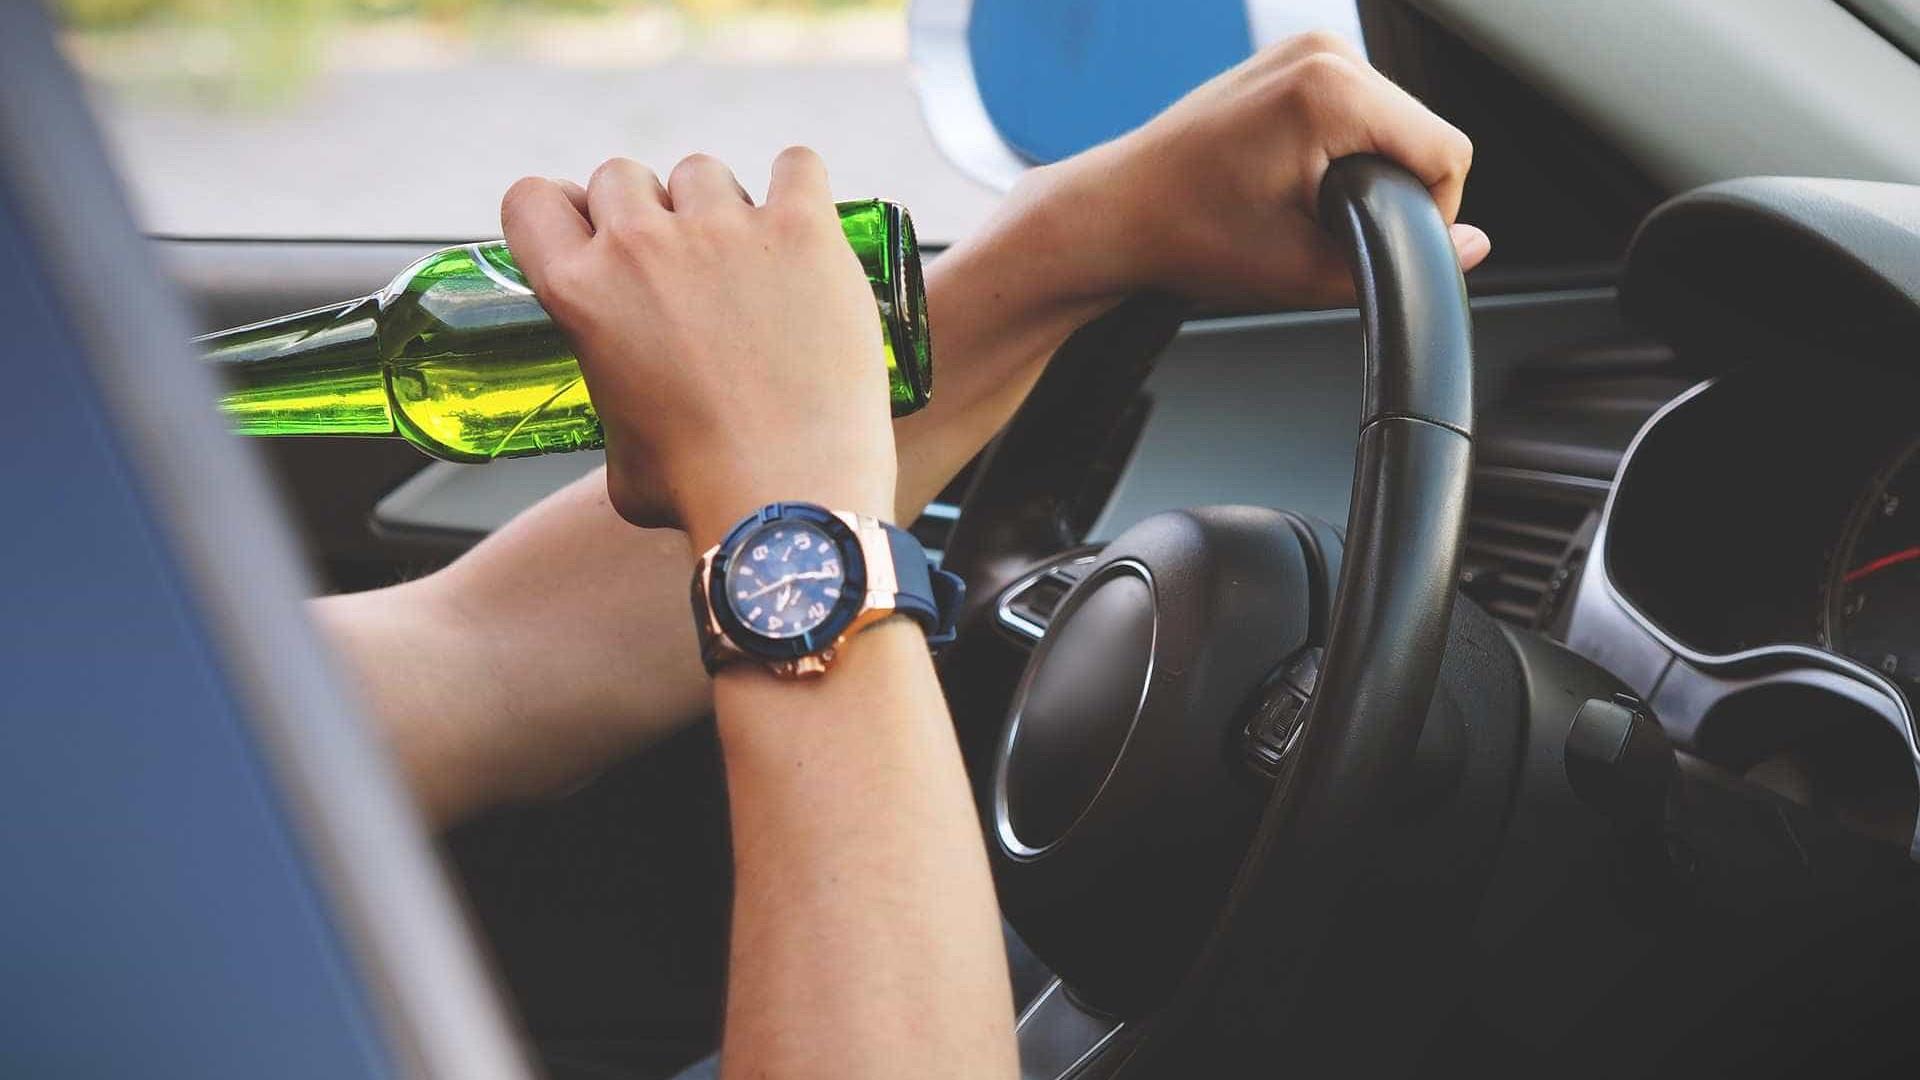 Consumo de álcool antes de dirigir sobe 16% após lei seca